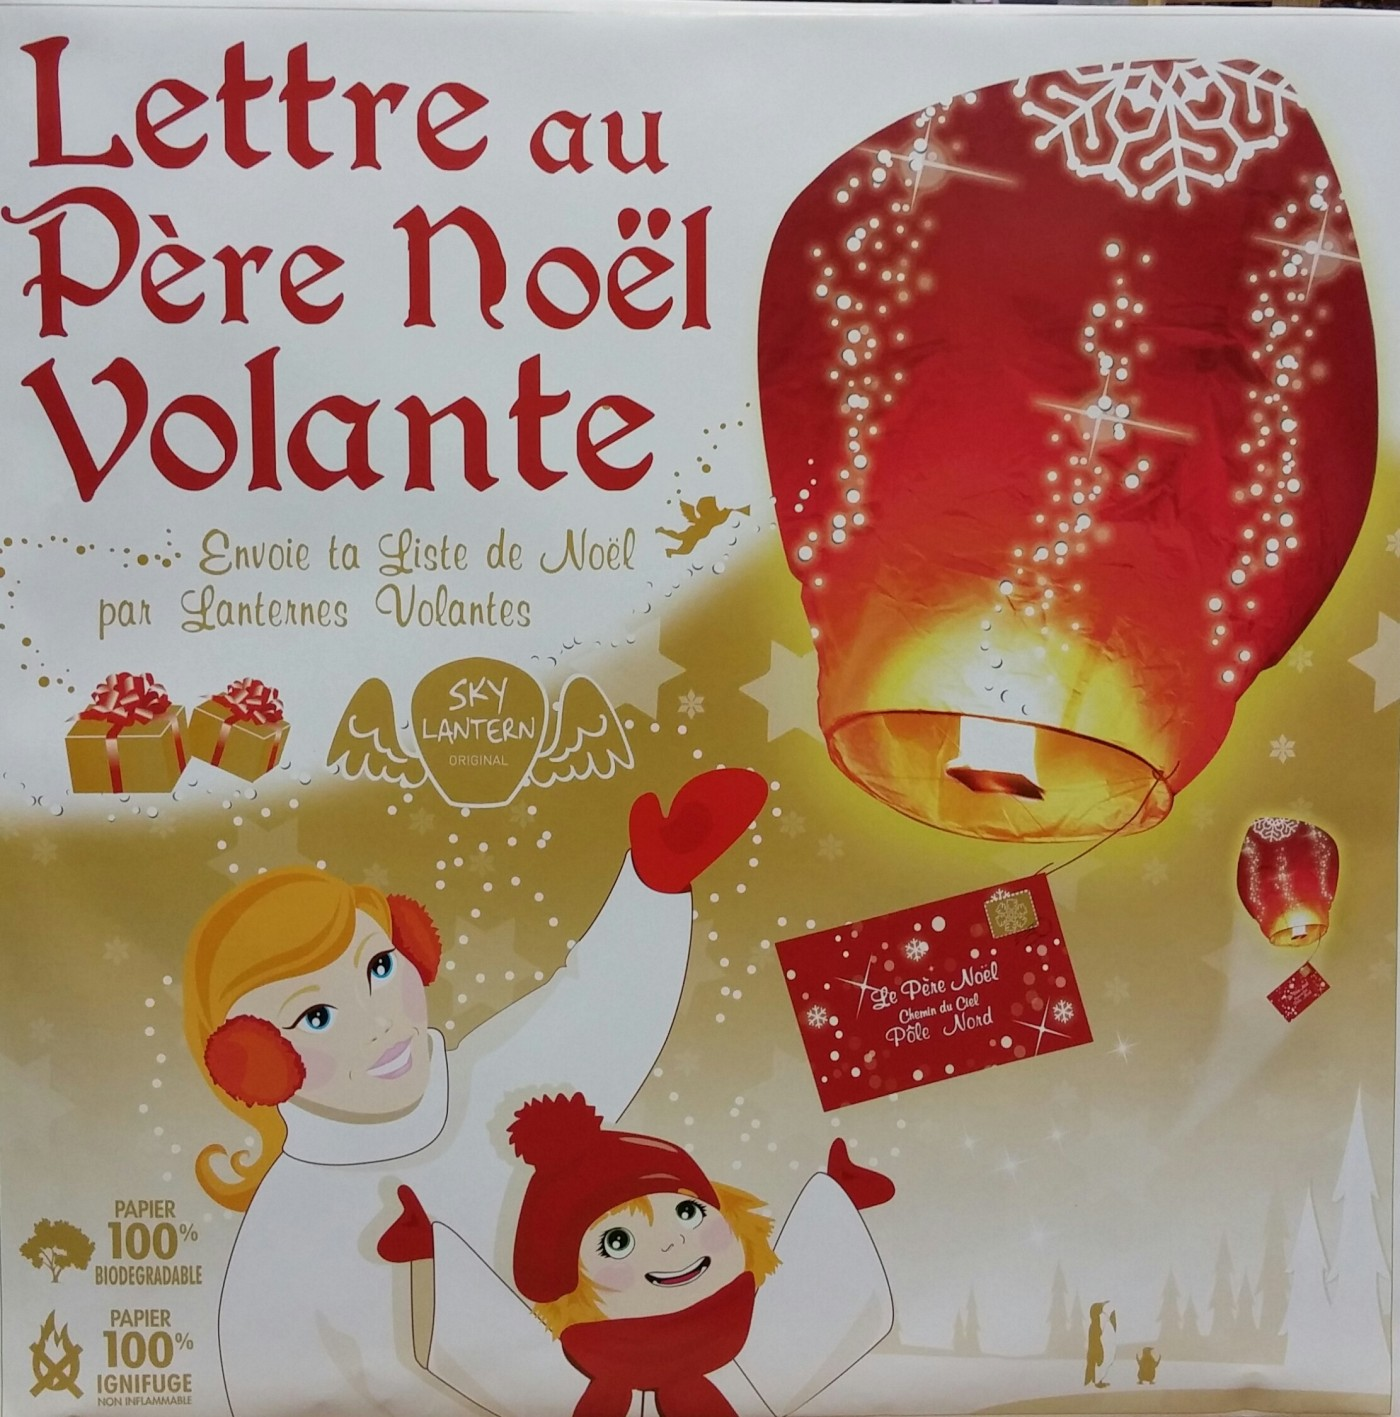 Lettre Au Pere Noel Volante.J Ai Choisi Pour Ma Fille La Lettre Au Pere Noel Blog Zodio